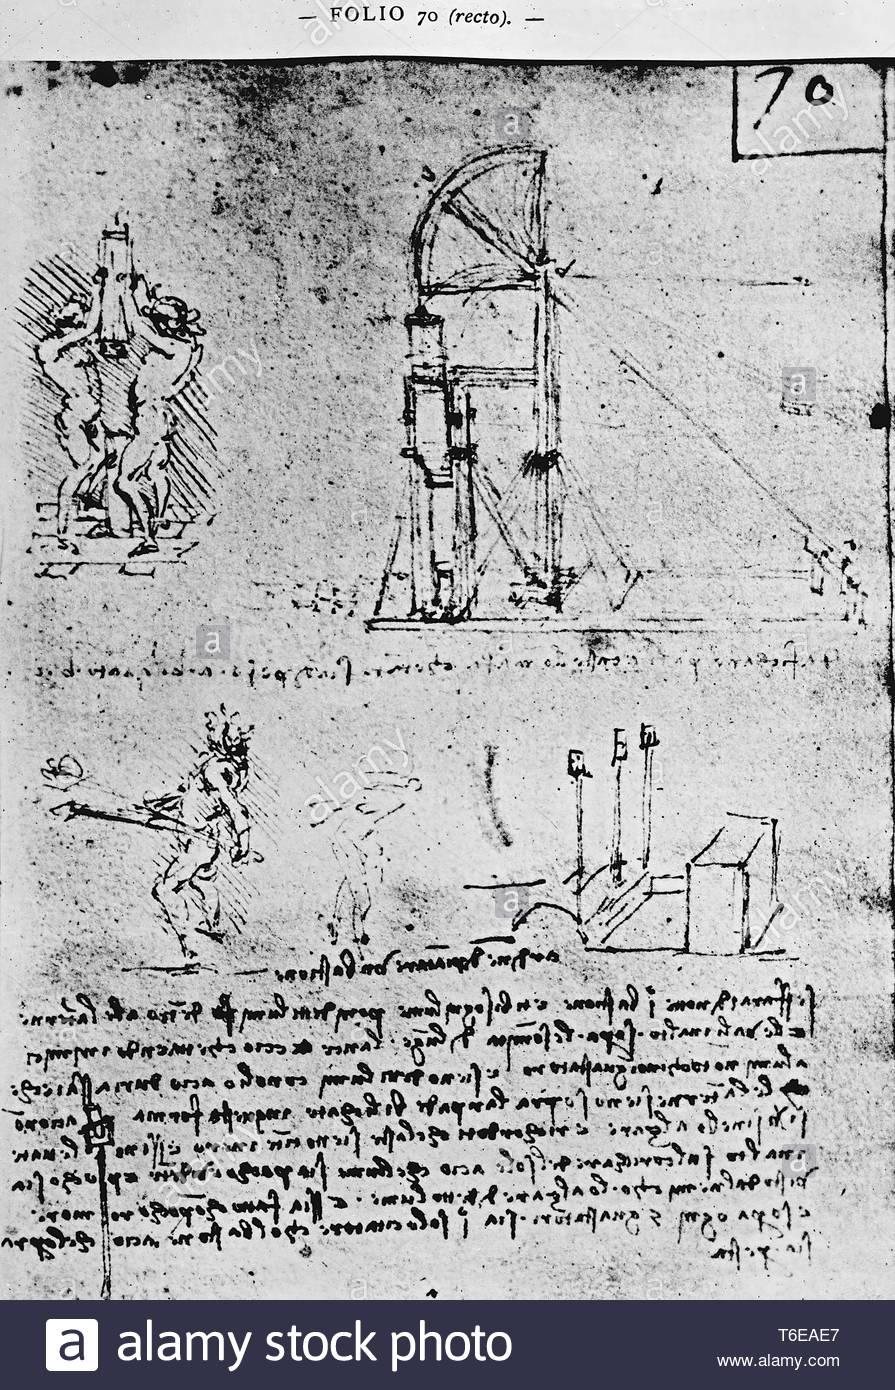 Leonardo da Vinci-Suggestions on how to construct a bastion at night, fol - Stock Image